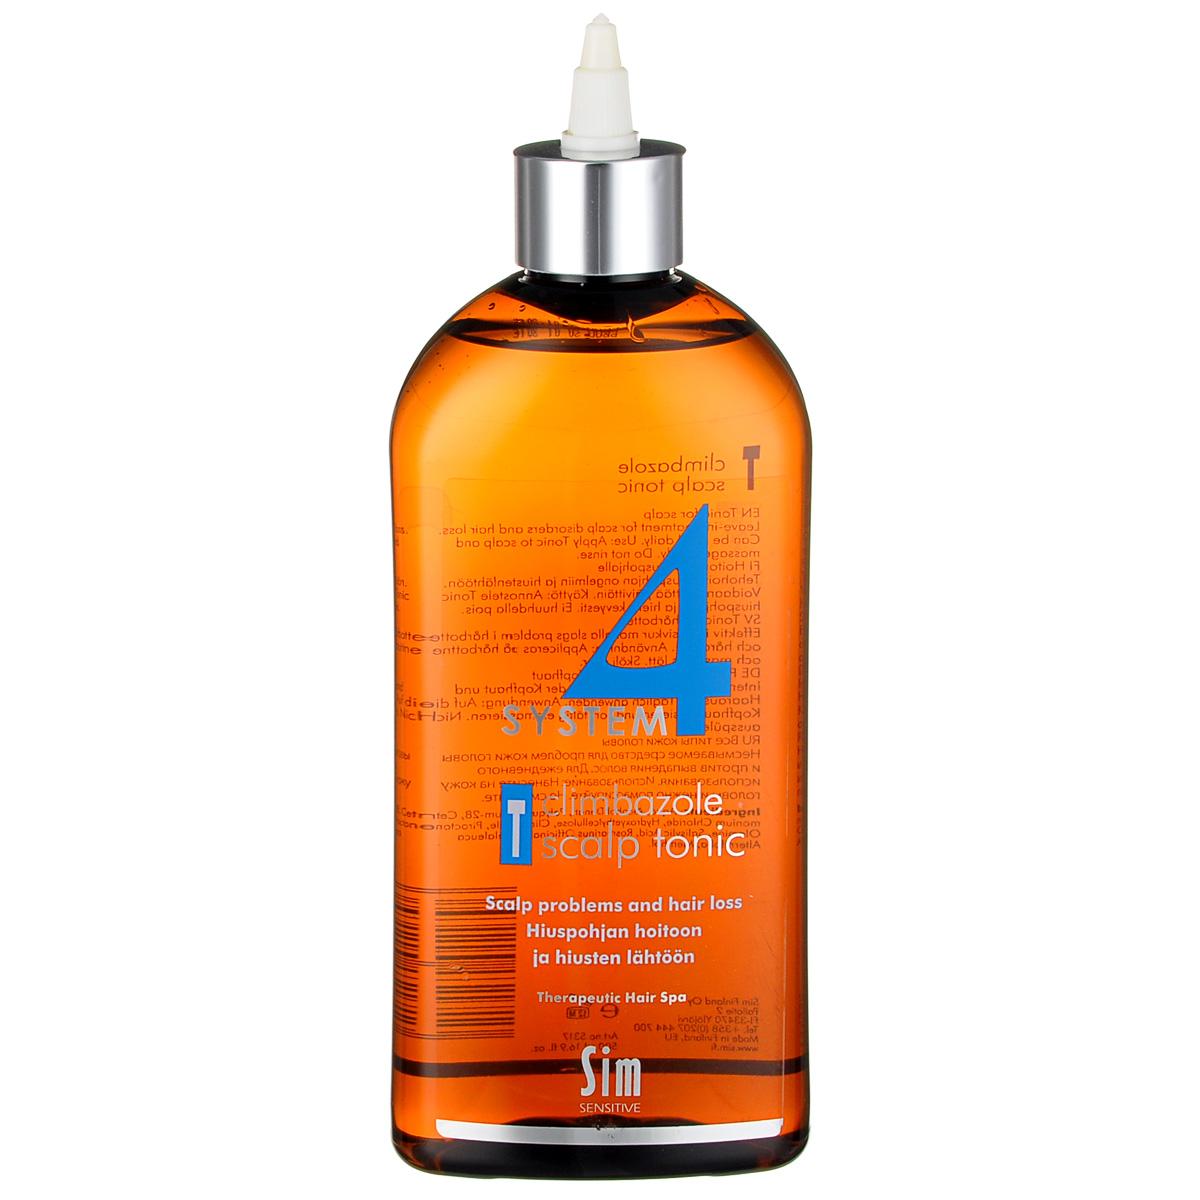 SIM SENSITIVE Терапевтический тоник Т SYSTEM 4 Climbazole Scalp Tonic «Т» , 500 мл sim sensitive терапевтический шампунь 3 system 4 mild climbazole shampoo 3 100 мл